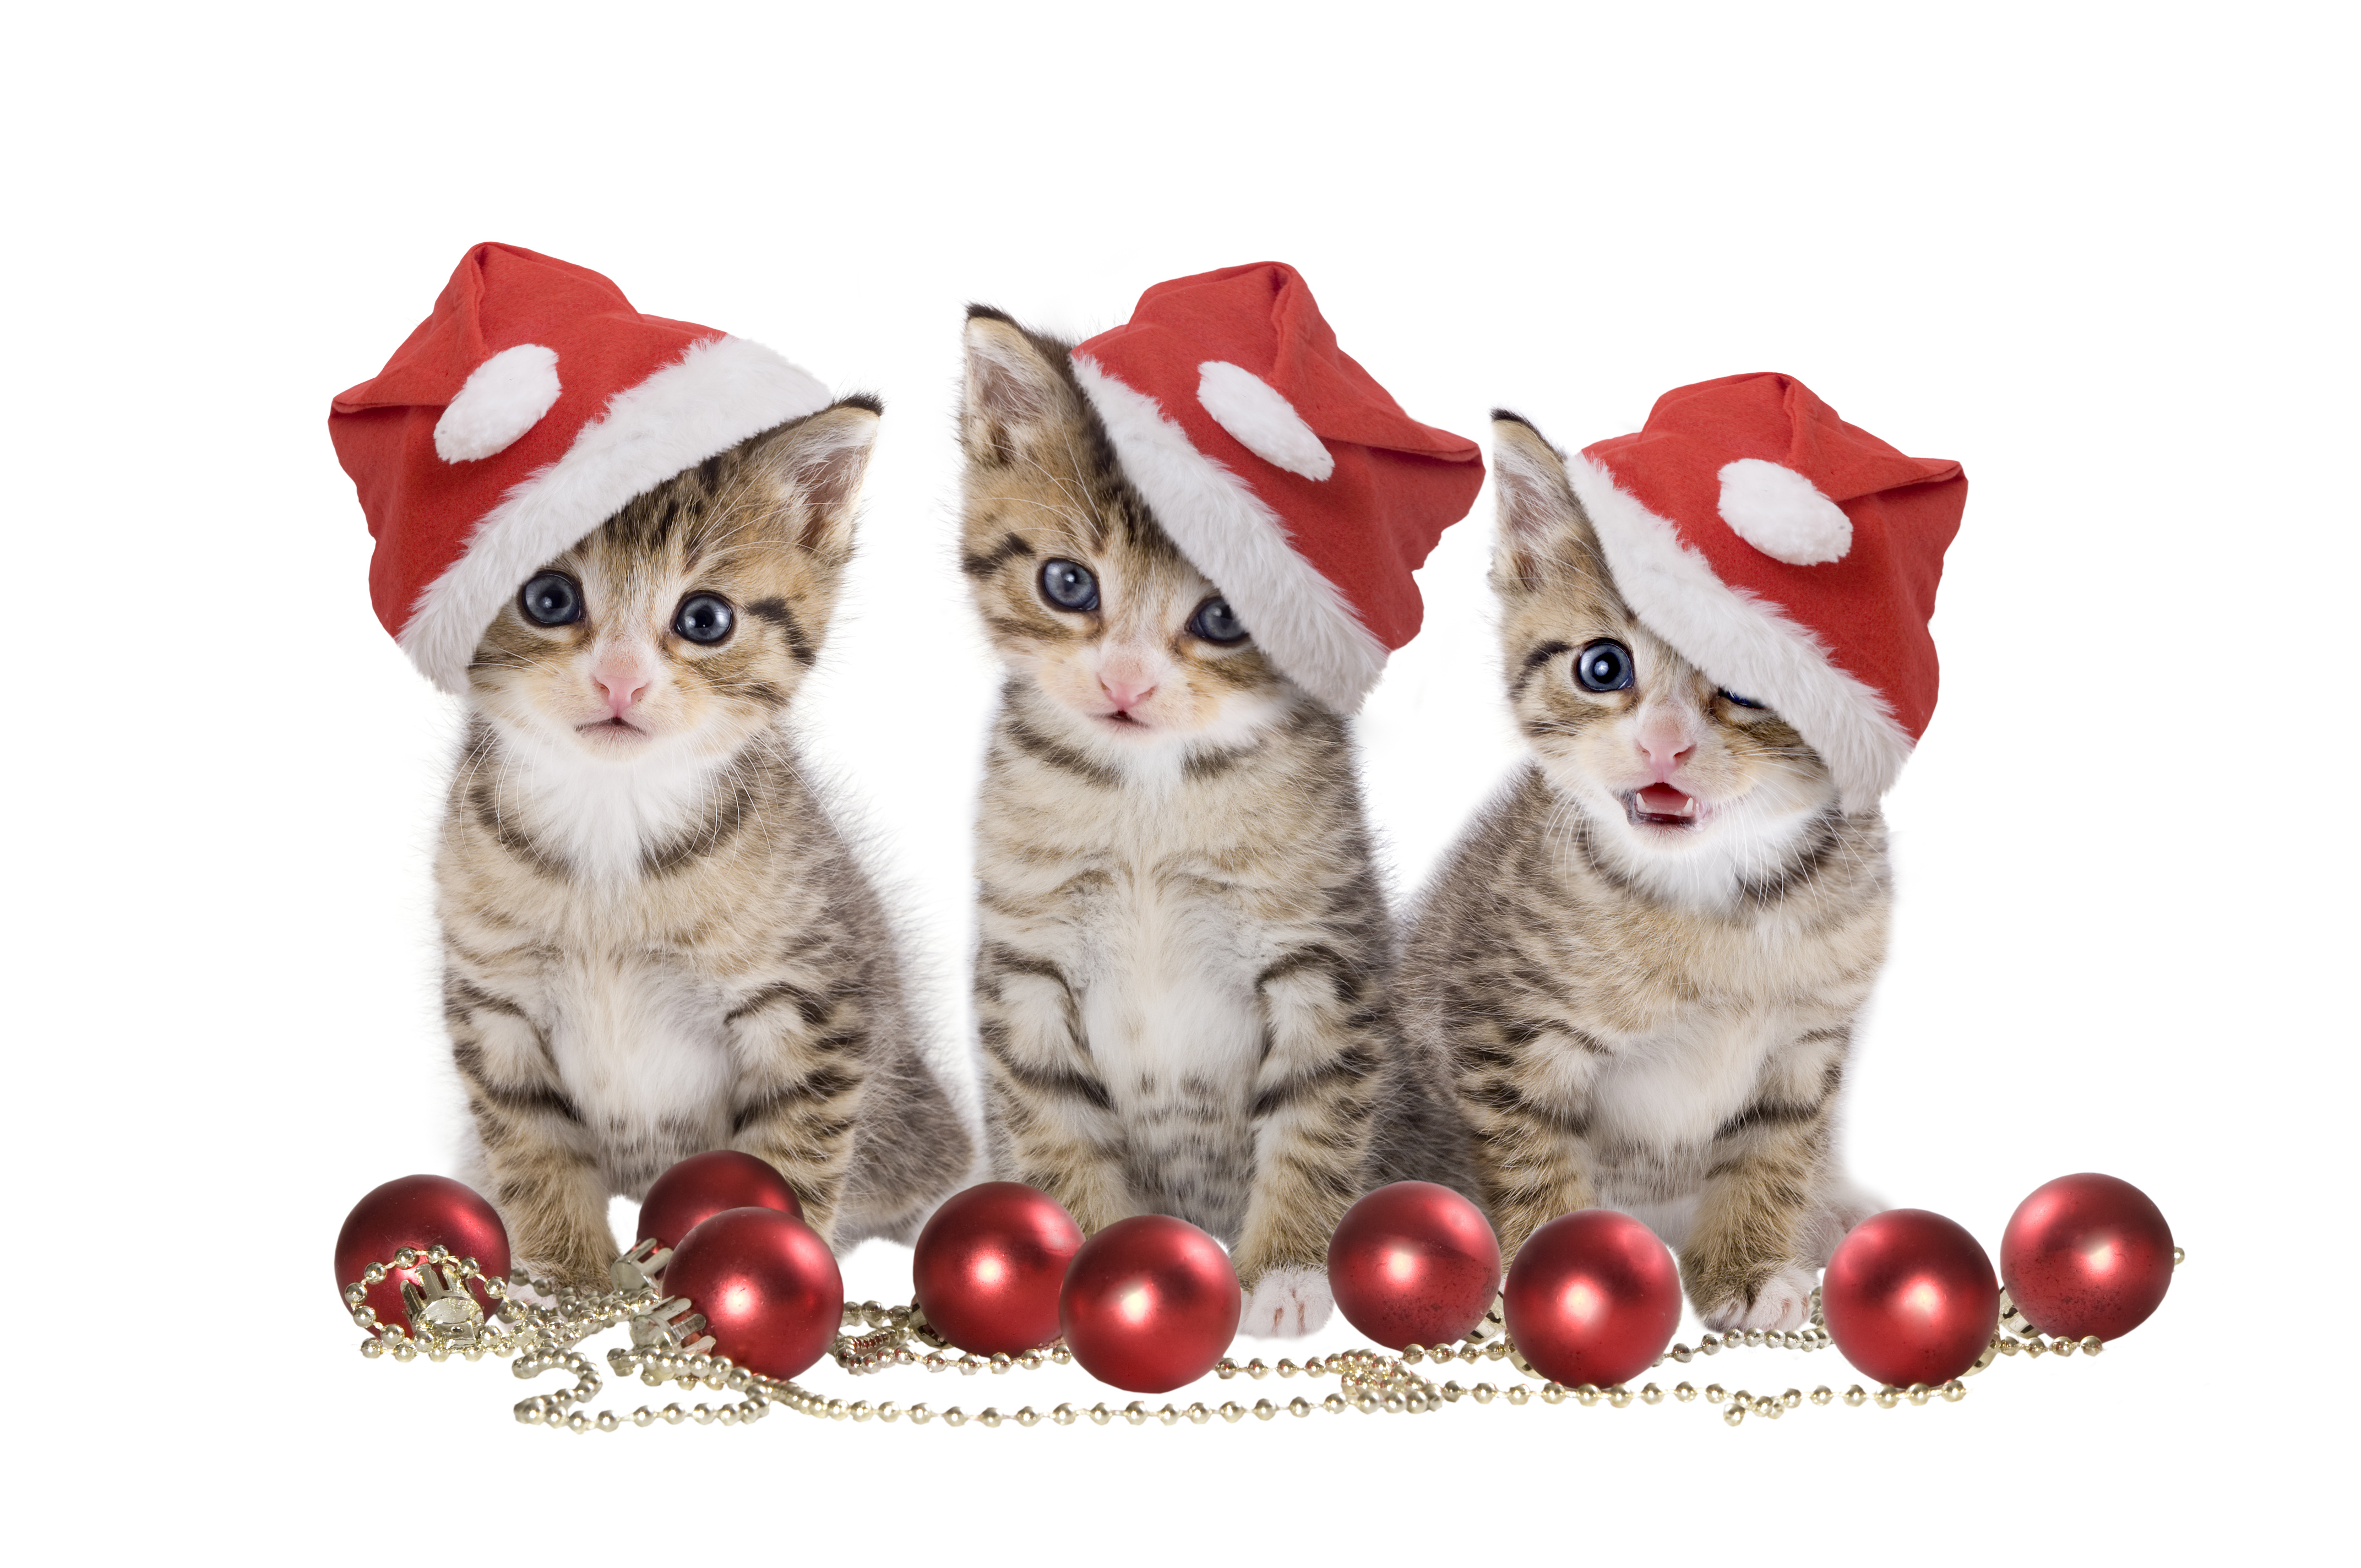 Free Christmas Wallpaper with Cats - WallpaperSafari